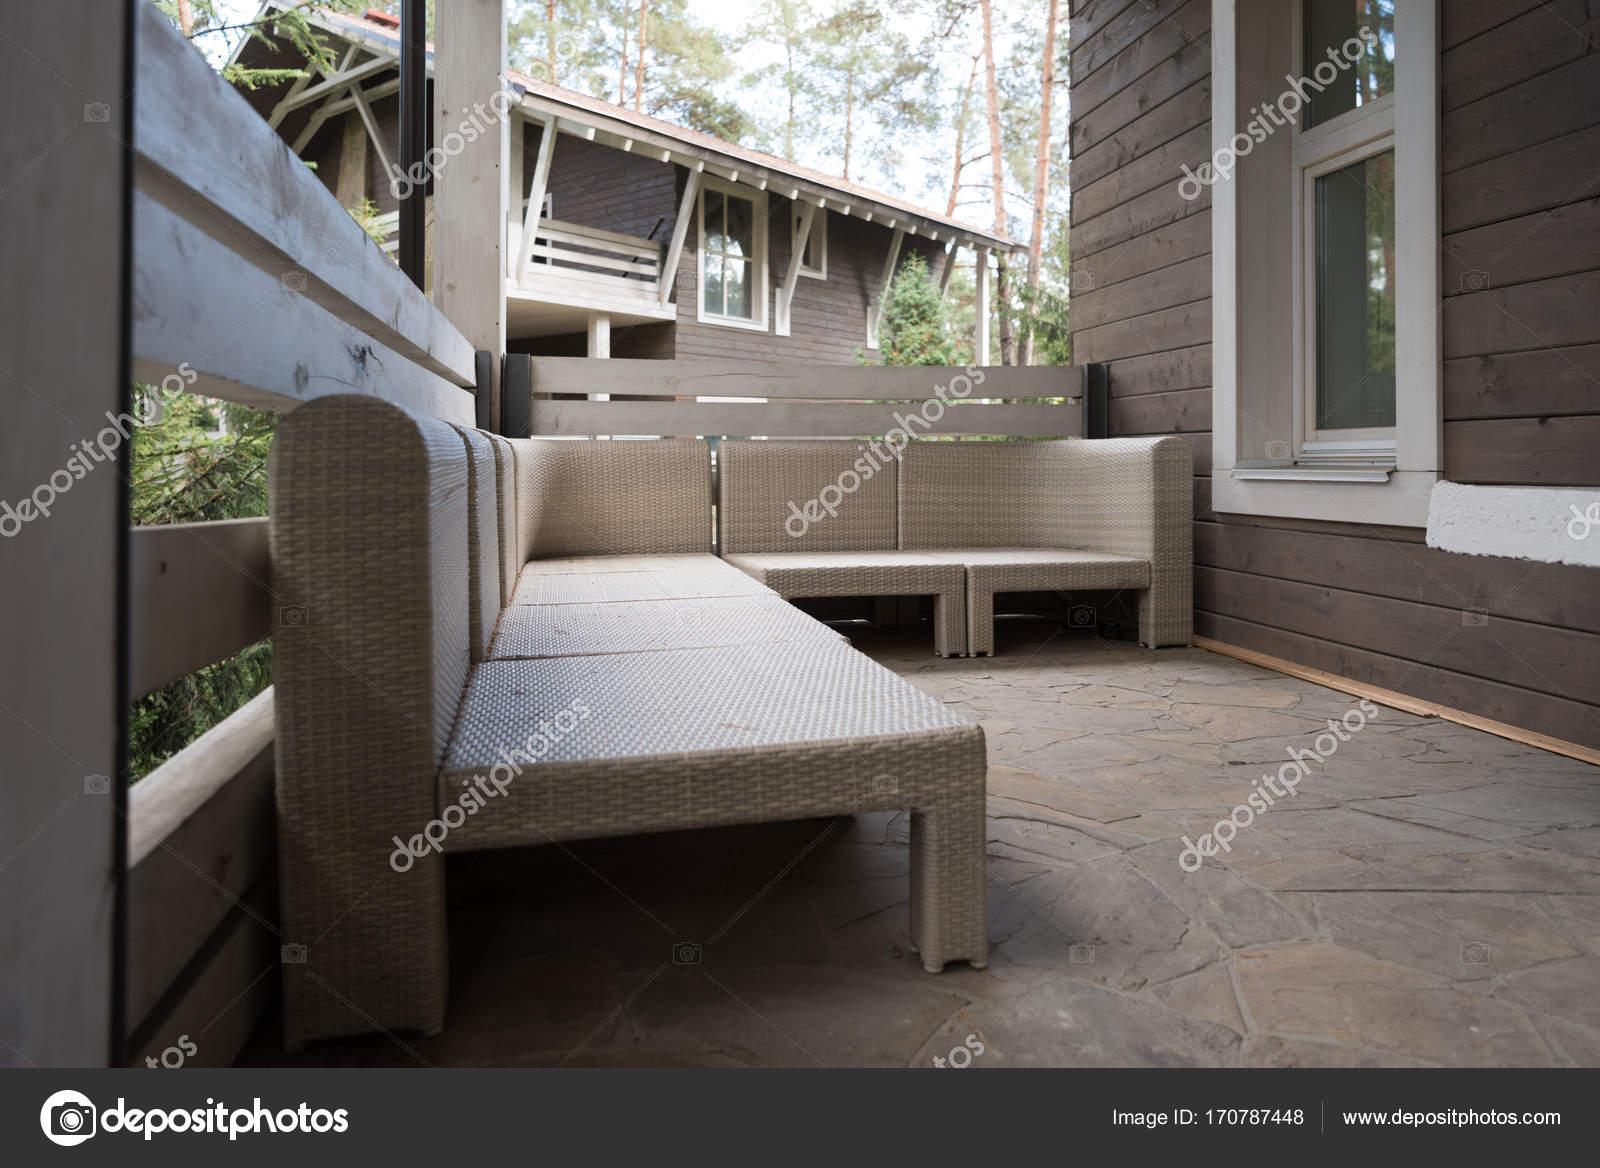 terrasse dans maison de campagne moderne — Photographie VitalikRadko ...